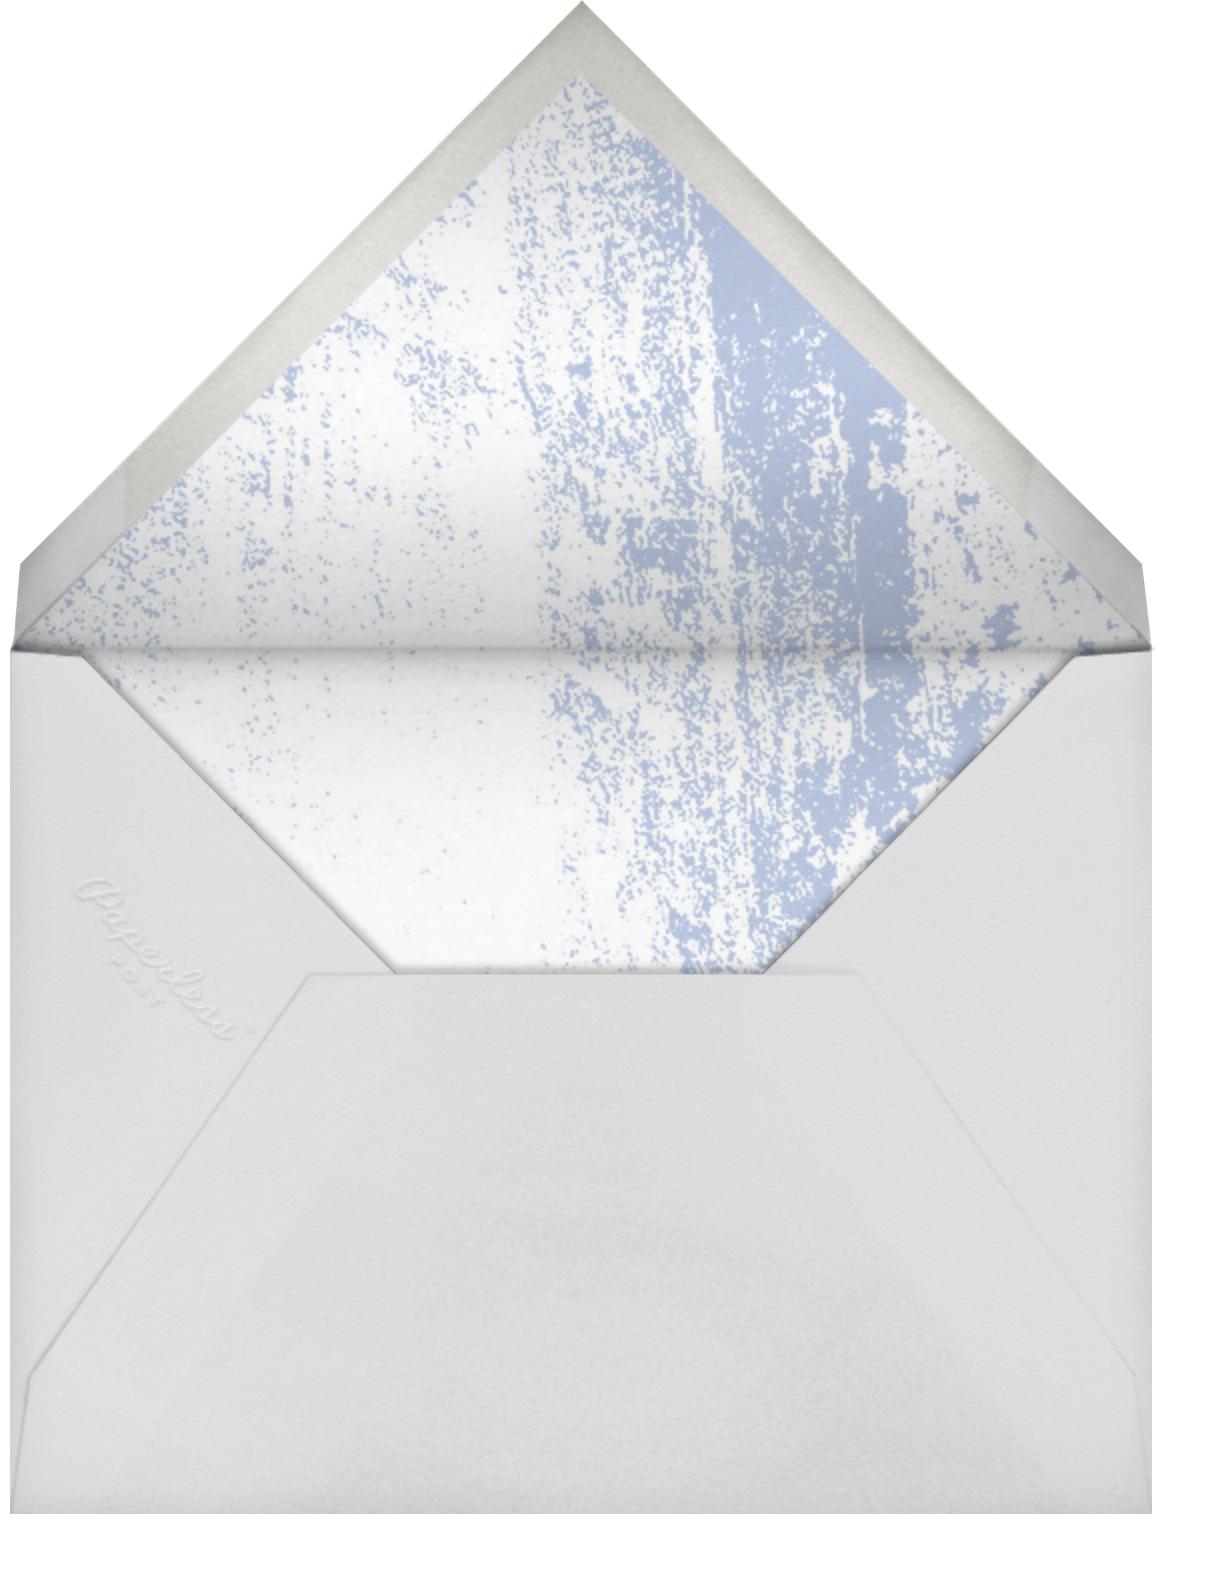 Coupling - Black - Kelly Wearstler - Envelope